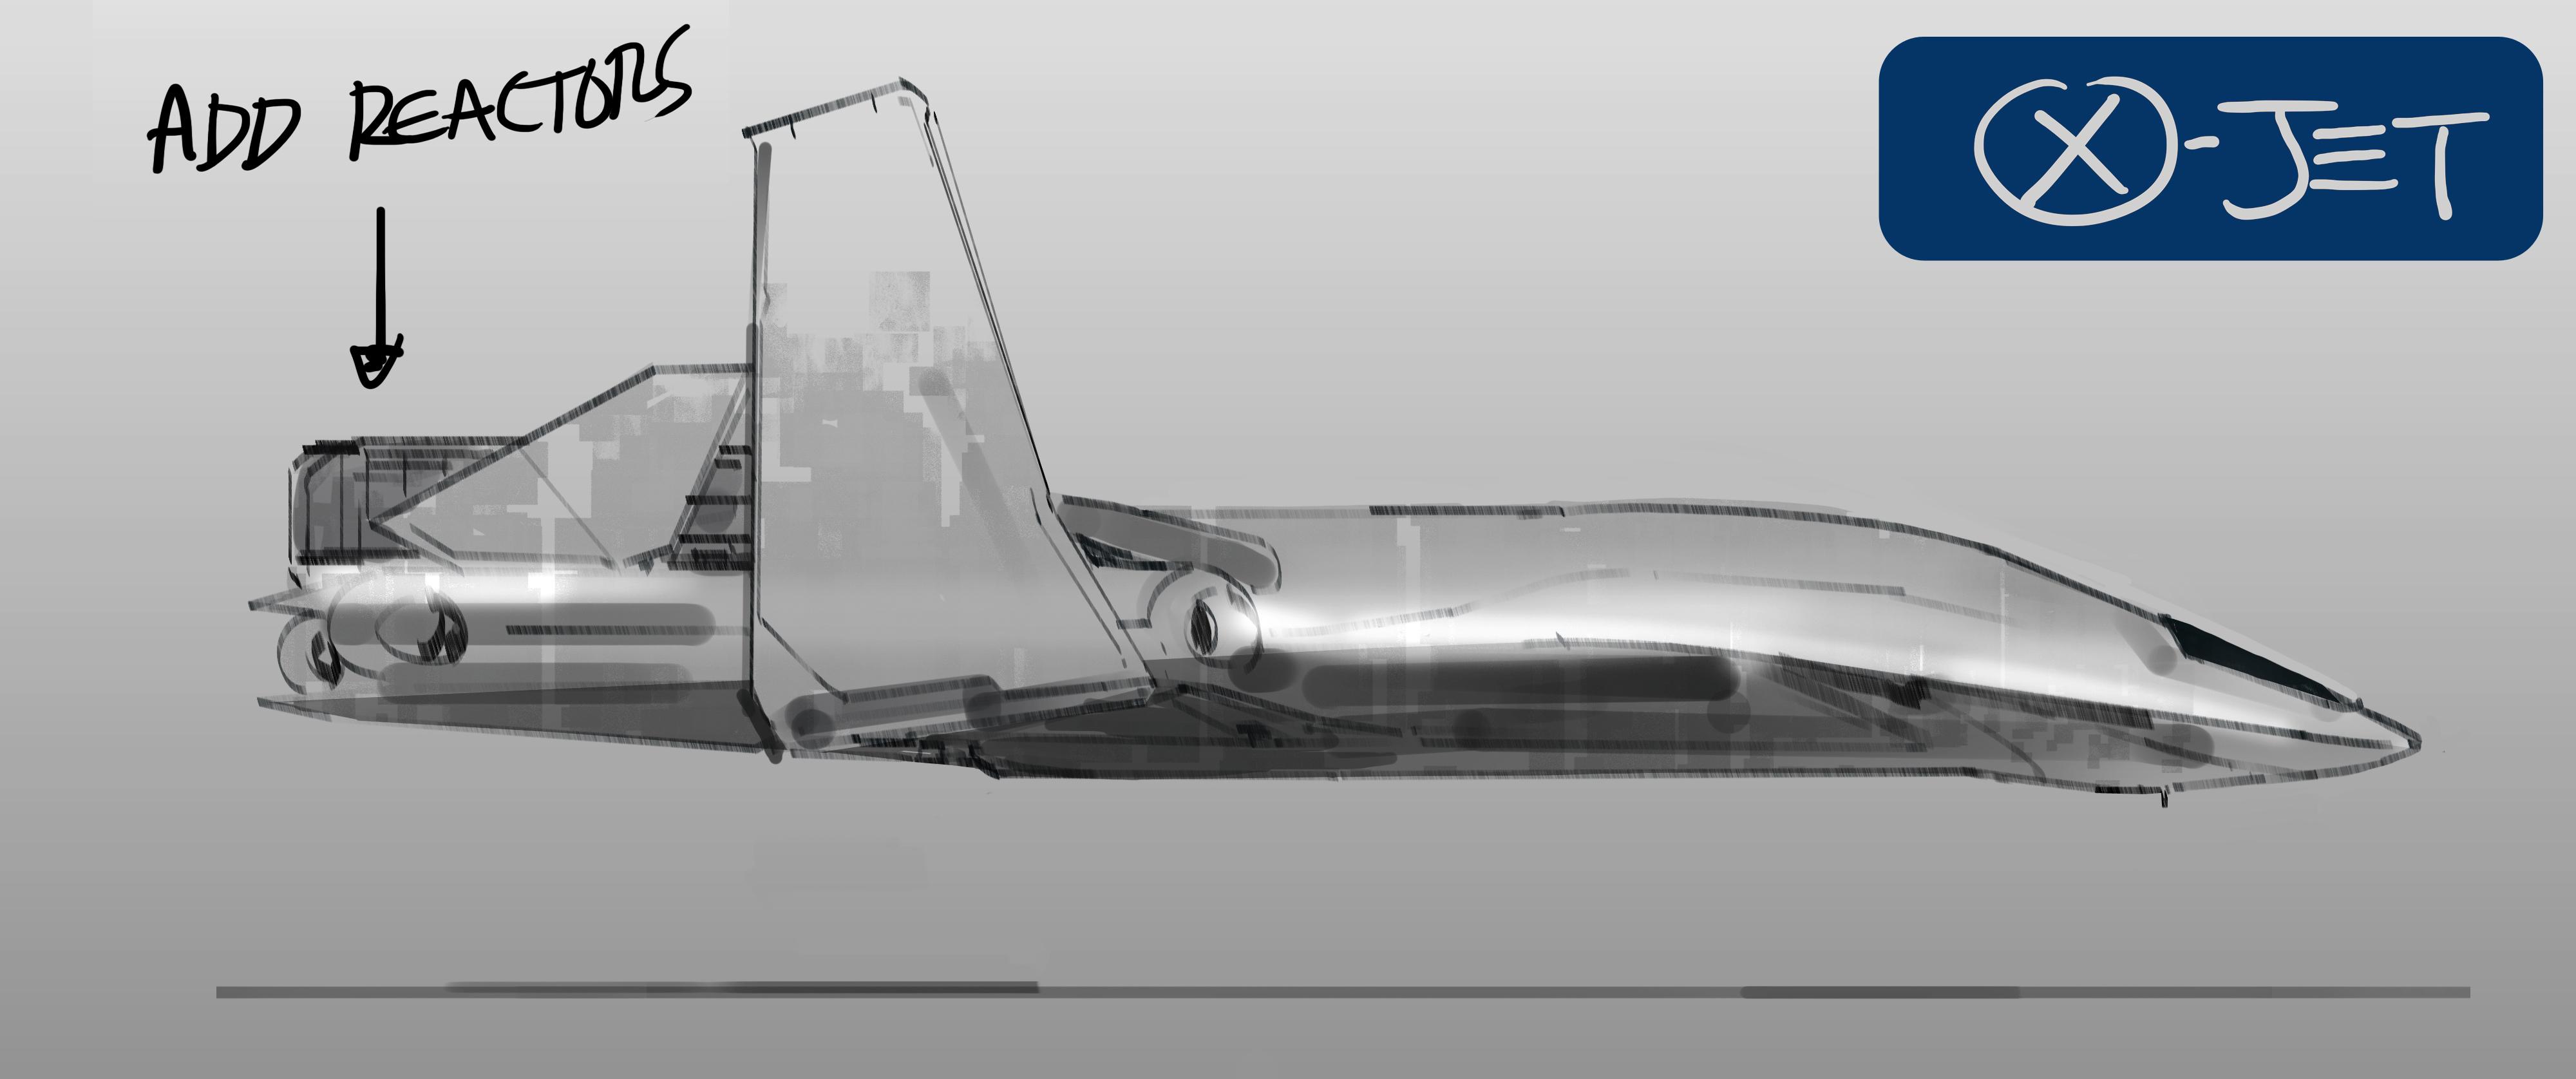 XJet_Sketch02b